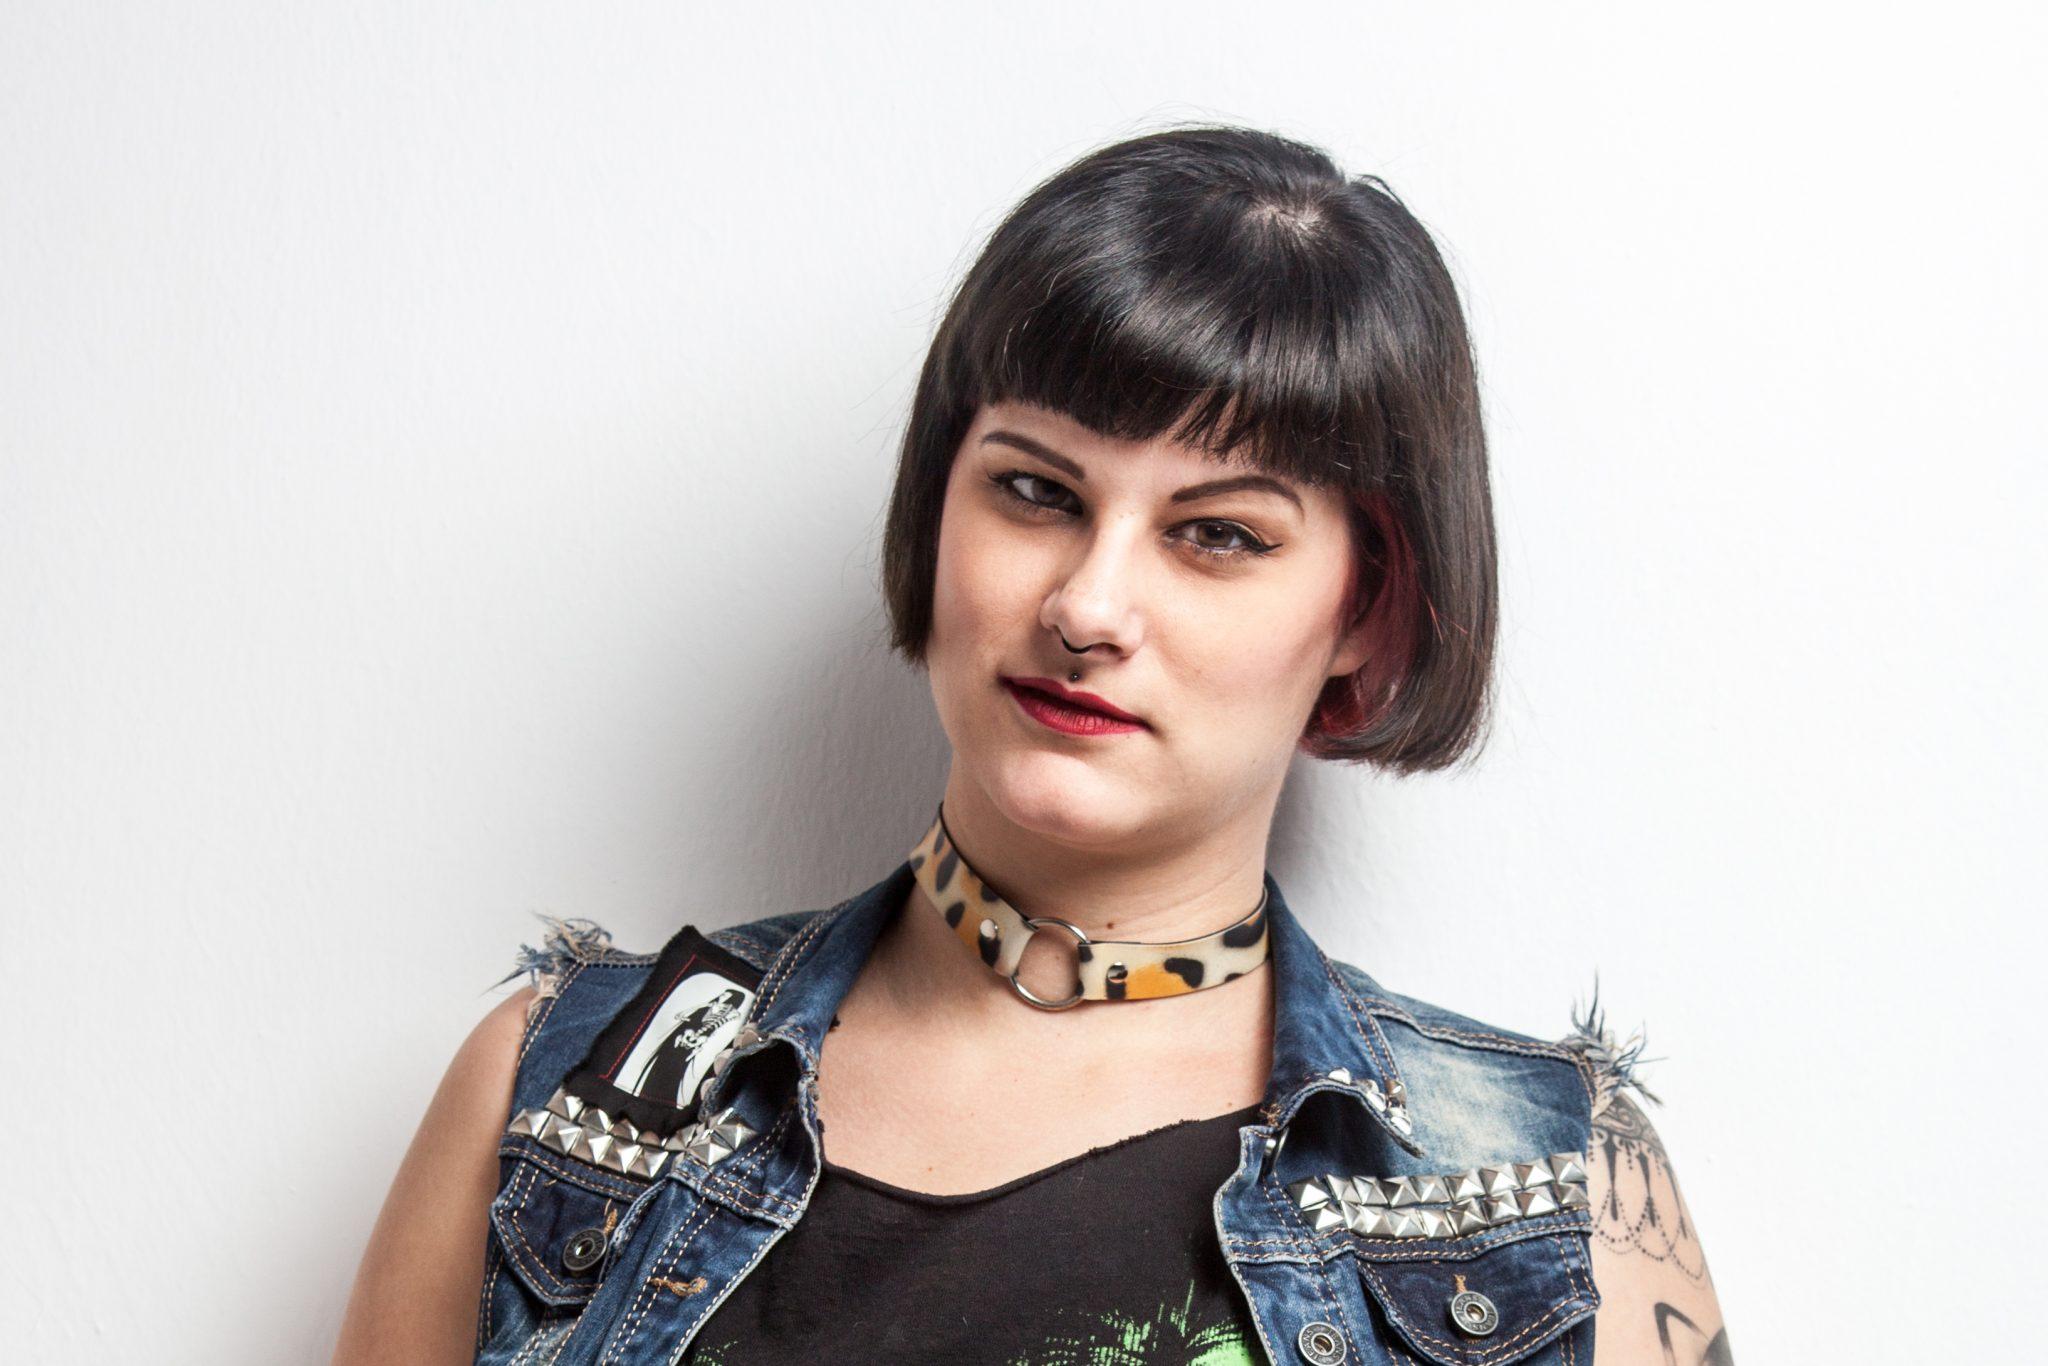 Entrevista a Lena Missfits. Modelo Alternativa